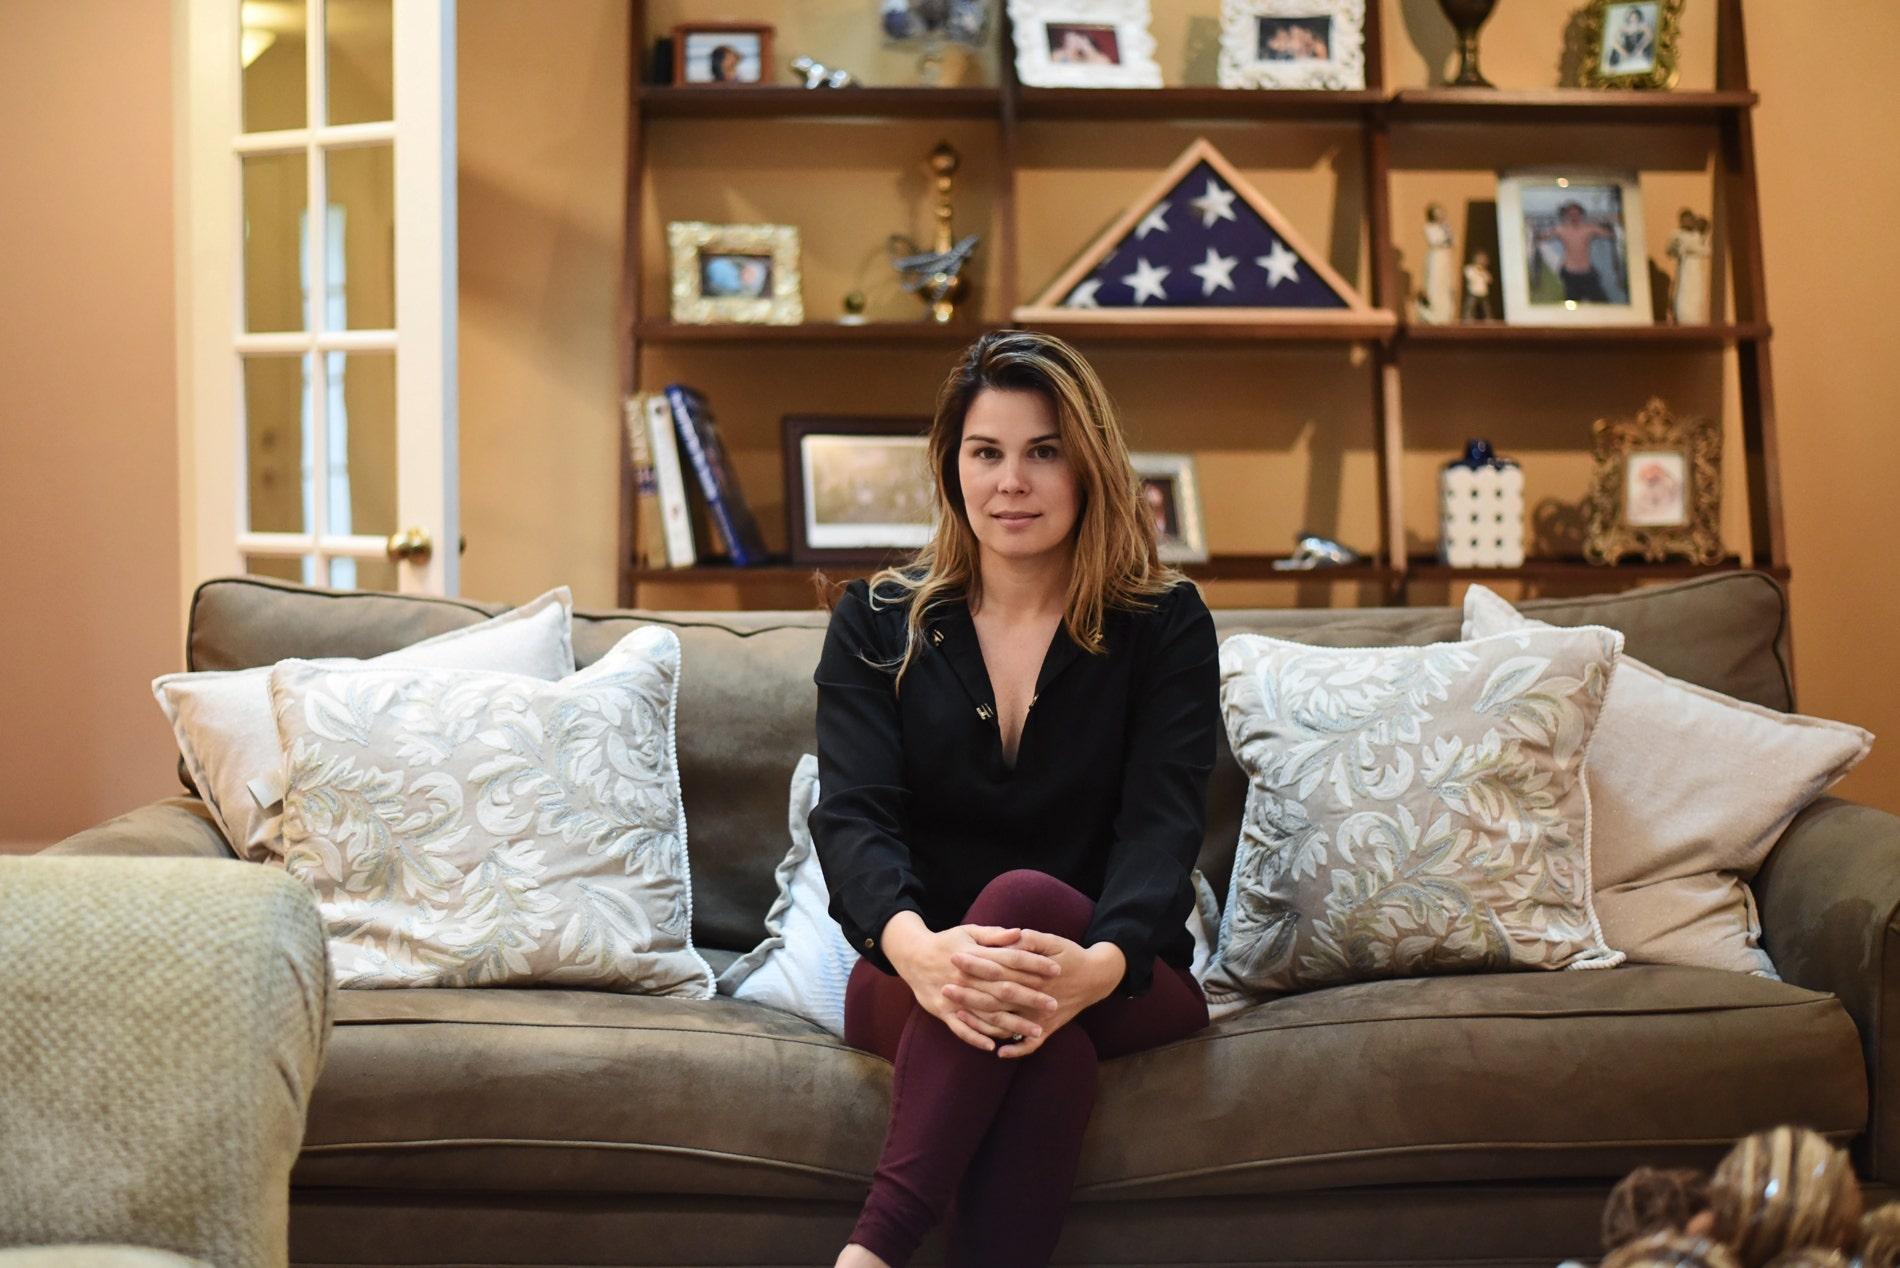 Navy SEAL widow's Memorial Day event honors America's fallen